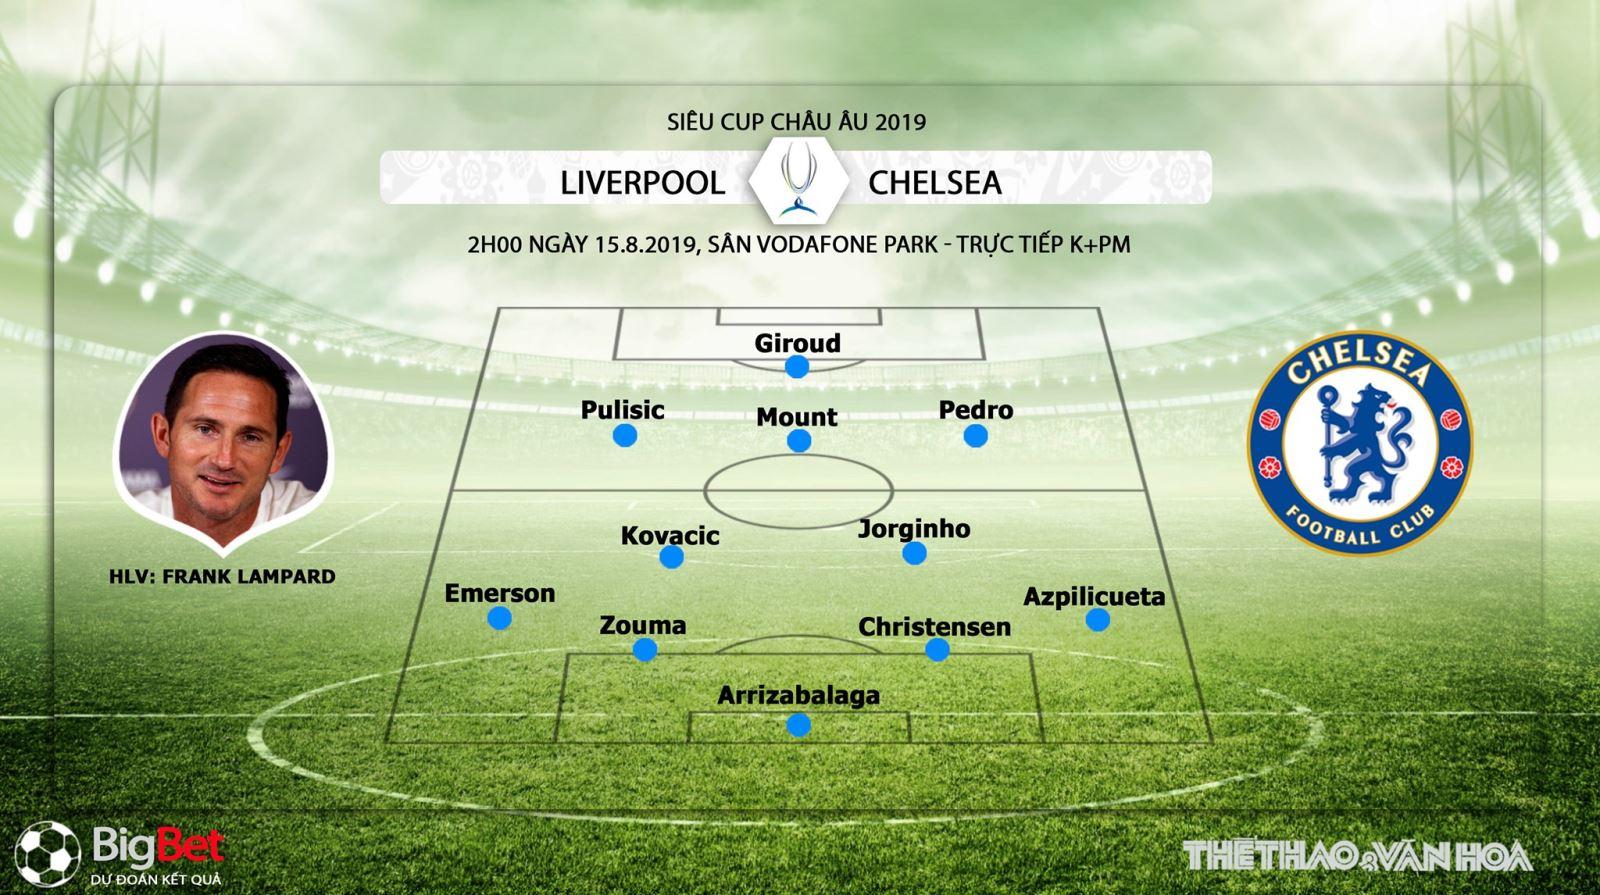 Liverpool vs Chelsea, chelsea, liverpool, trực tiếp Liverpool vs Chelsea, xem trực tiếp Liverpool vs Chelsea, soi kèo Liverpool vs Chelsea, Siêu Cúp châu Âu